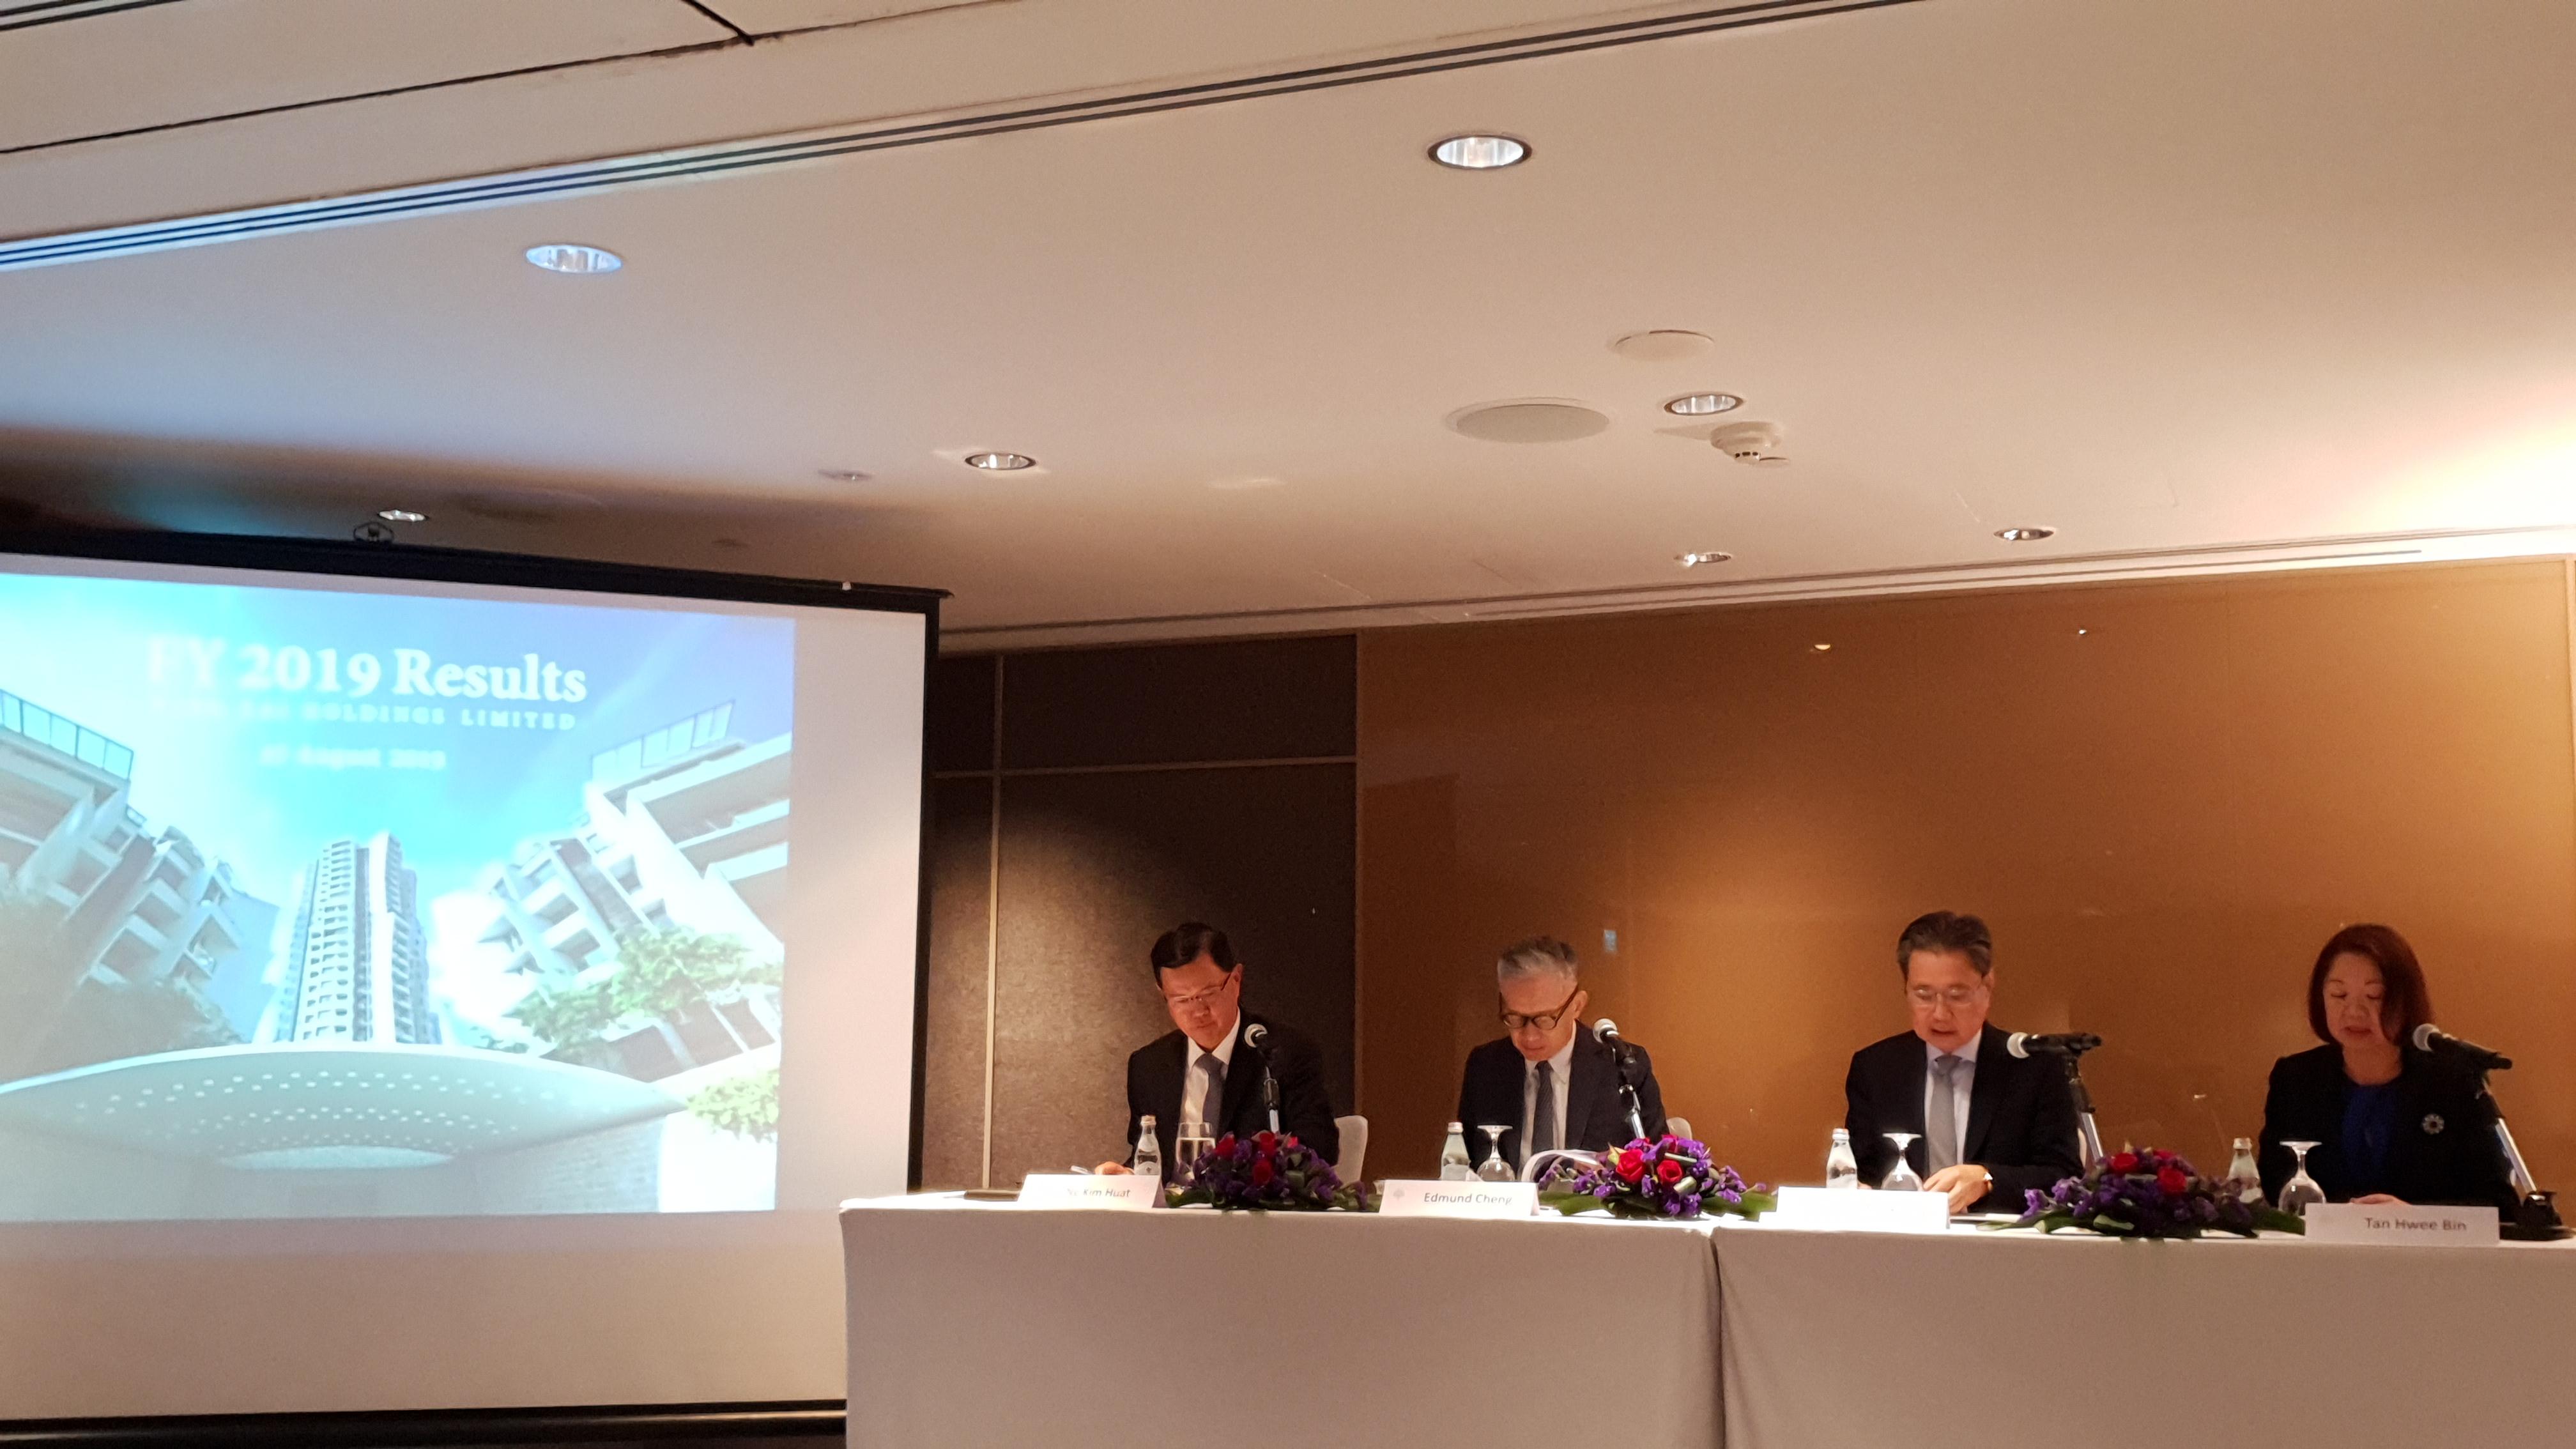 WING TAI HOLDINGS - From left: Ng Kim Huat, group chief financial officer; Edmund Cheng, deputy chairman; Cheng Wai Keung, chairman; Tan Hwee Bin, executive director (Picture: EdgeProp Singapore)